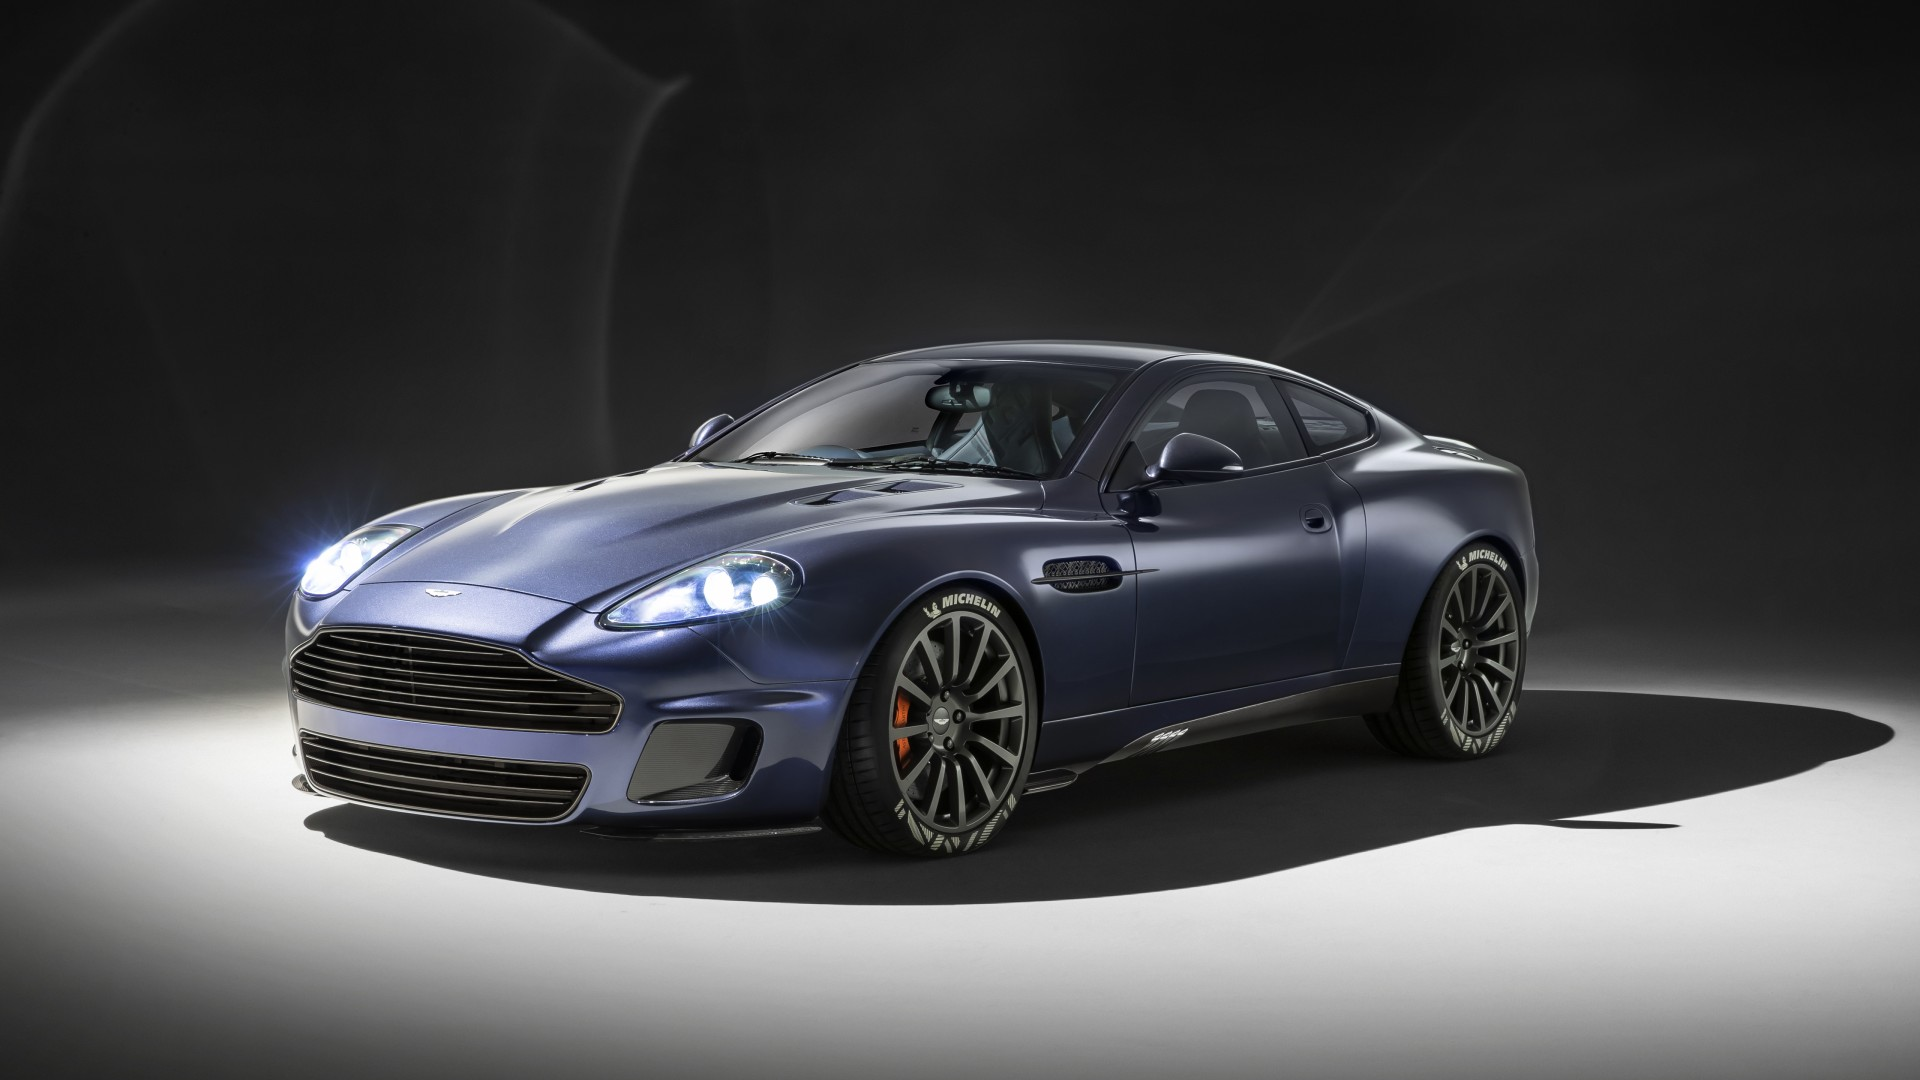 Aston Martin Vanquish 25 By Callum 2019 4k 2 Wallpaper Hd Car Wallpapers Id 13203